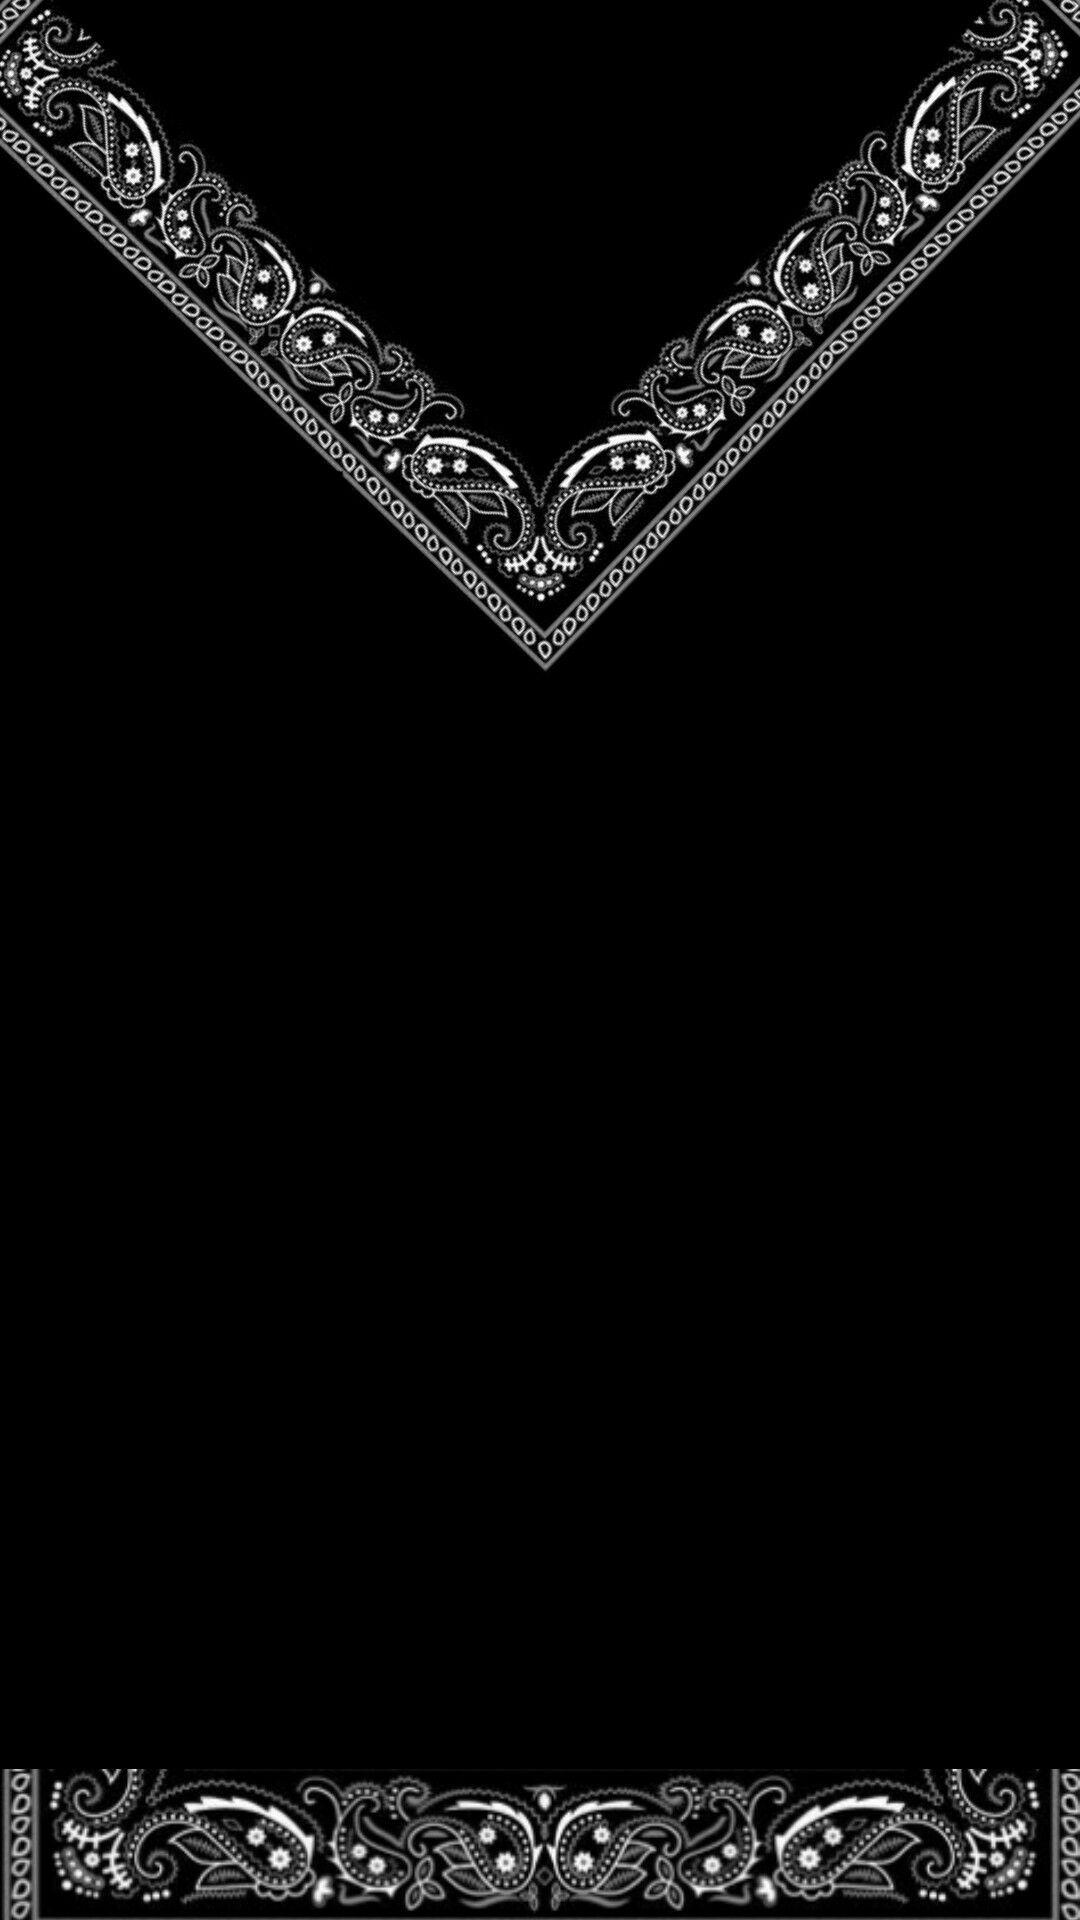 Black Bandana Wallpaper Hypebeast Wallpaper Bandana Design Skull Wallpaper